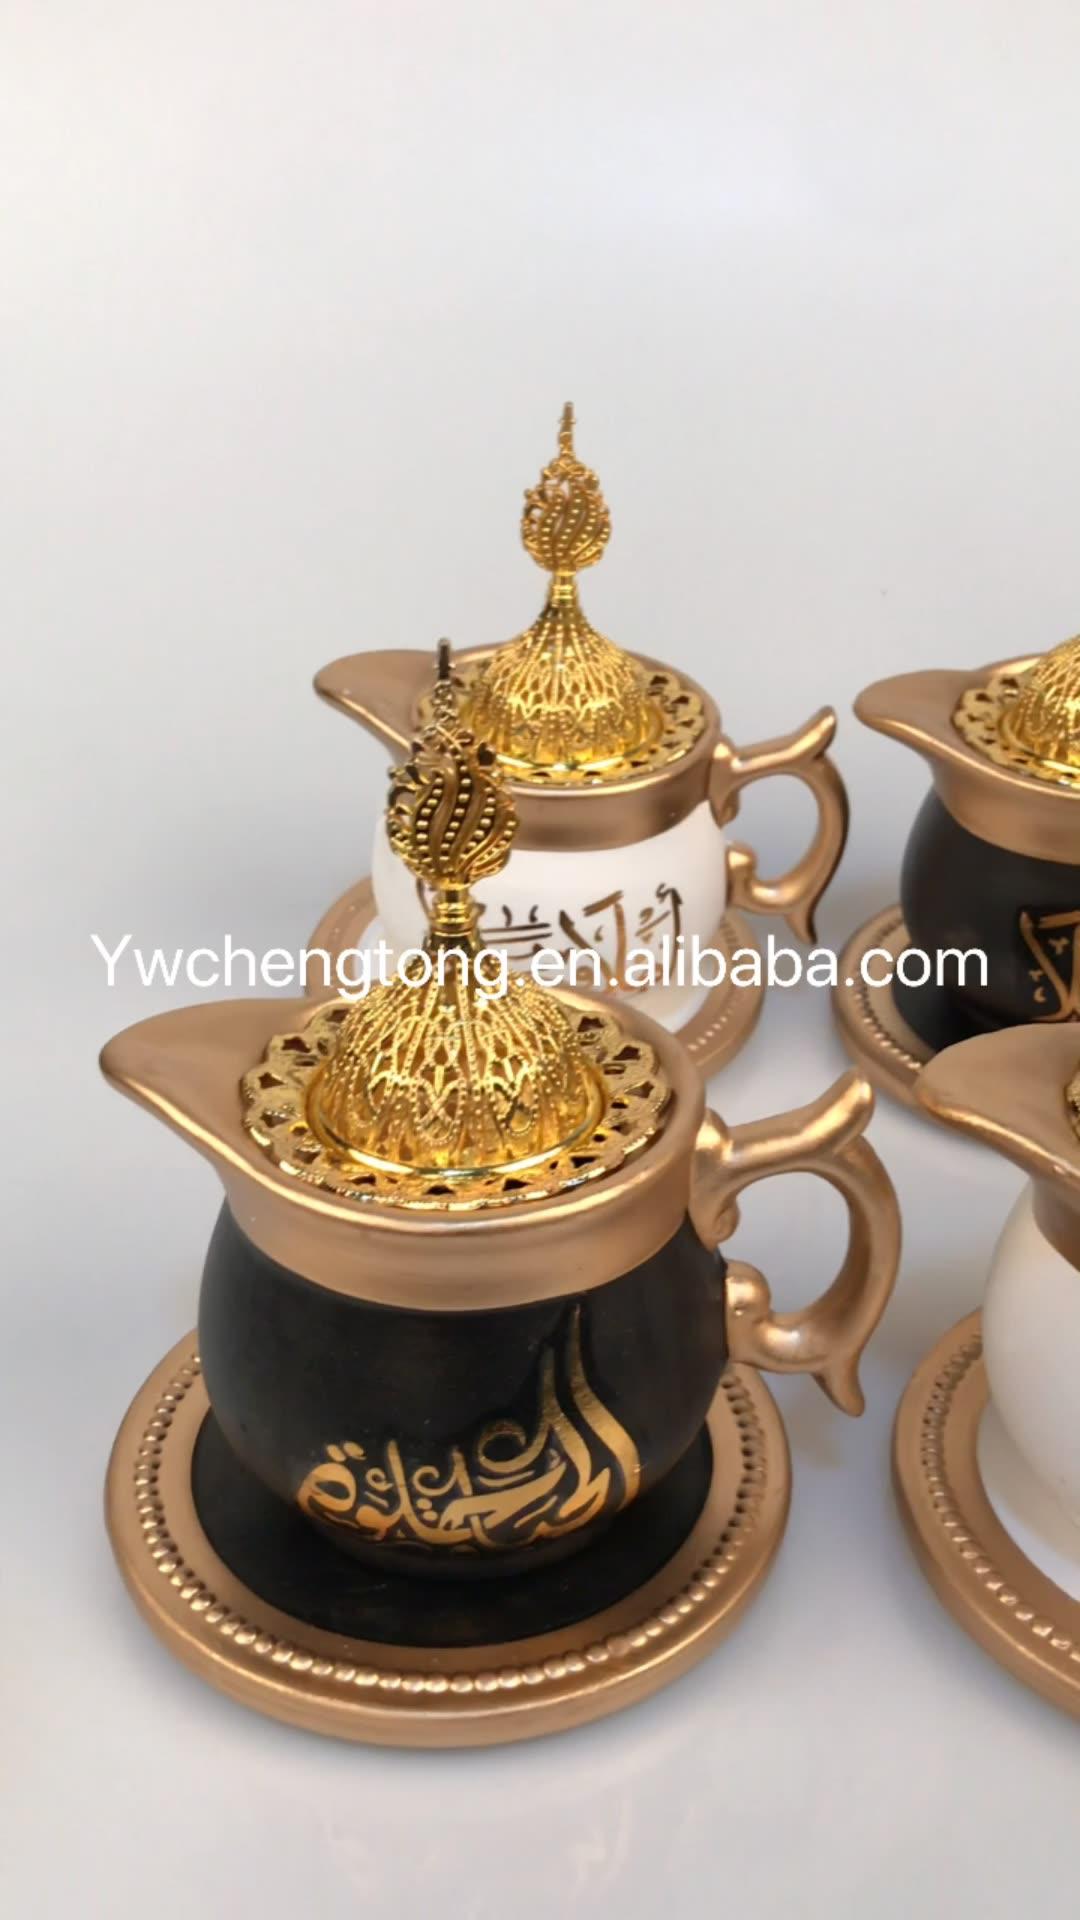 2020 New Crystal Styles Ceramic Mubkhar Arabe Incense Burner Wholesale